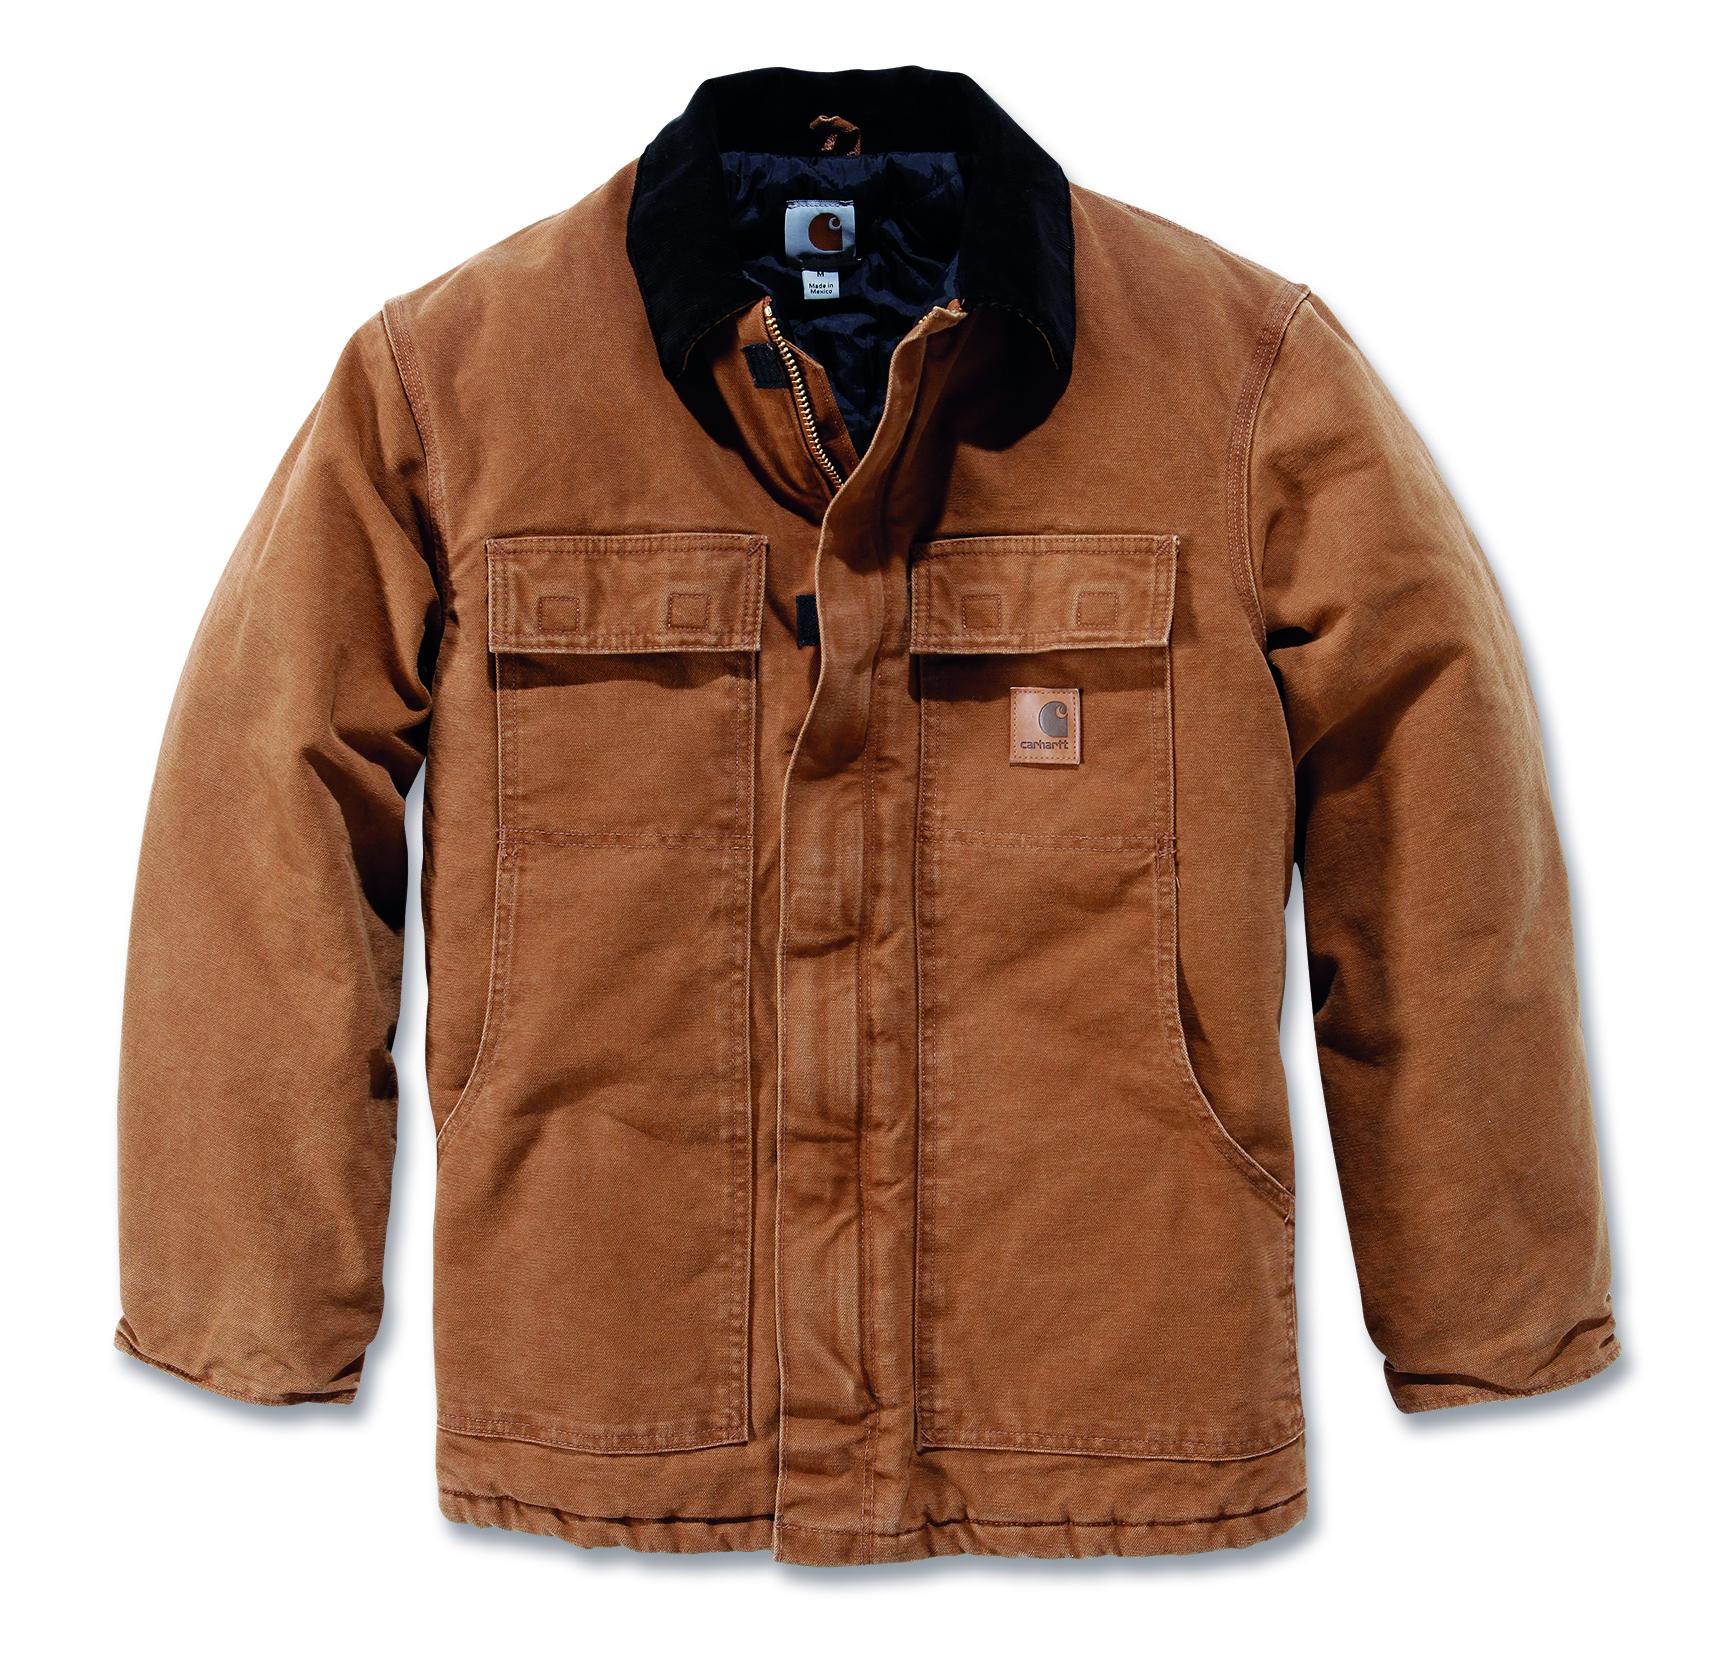 sandstone men Shop carhartt sherpa lined sandstone sierra jacket - mens | 4 star rating on 2 reviews for carhartt sherpa lined sandstone sierra jacket - mens + free shipping over $49.